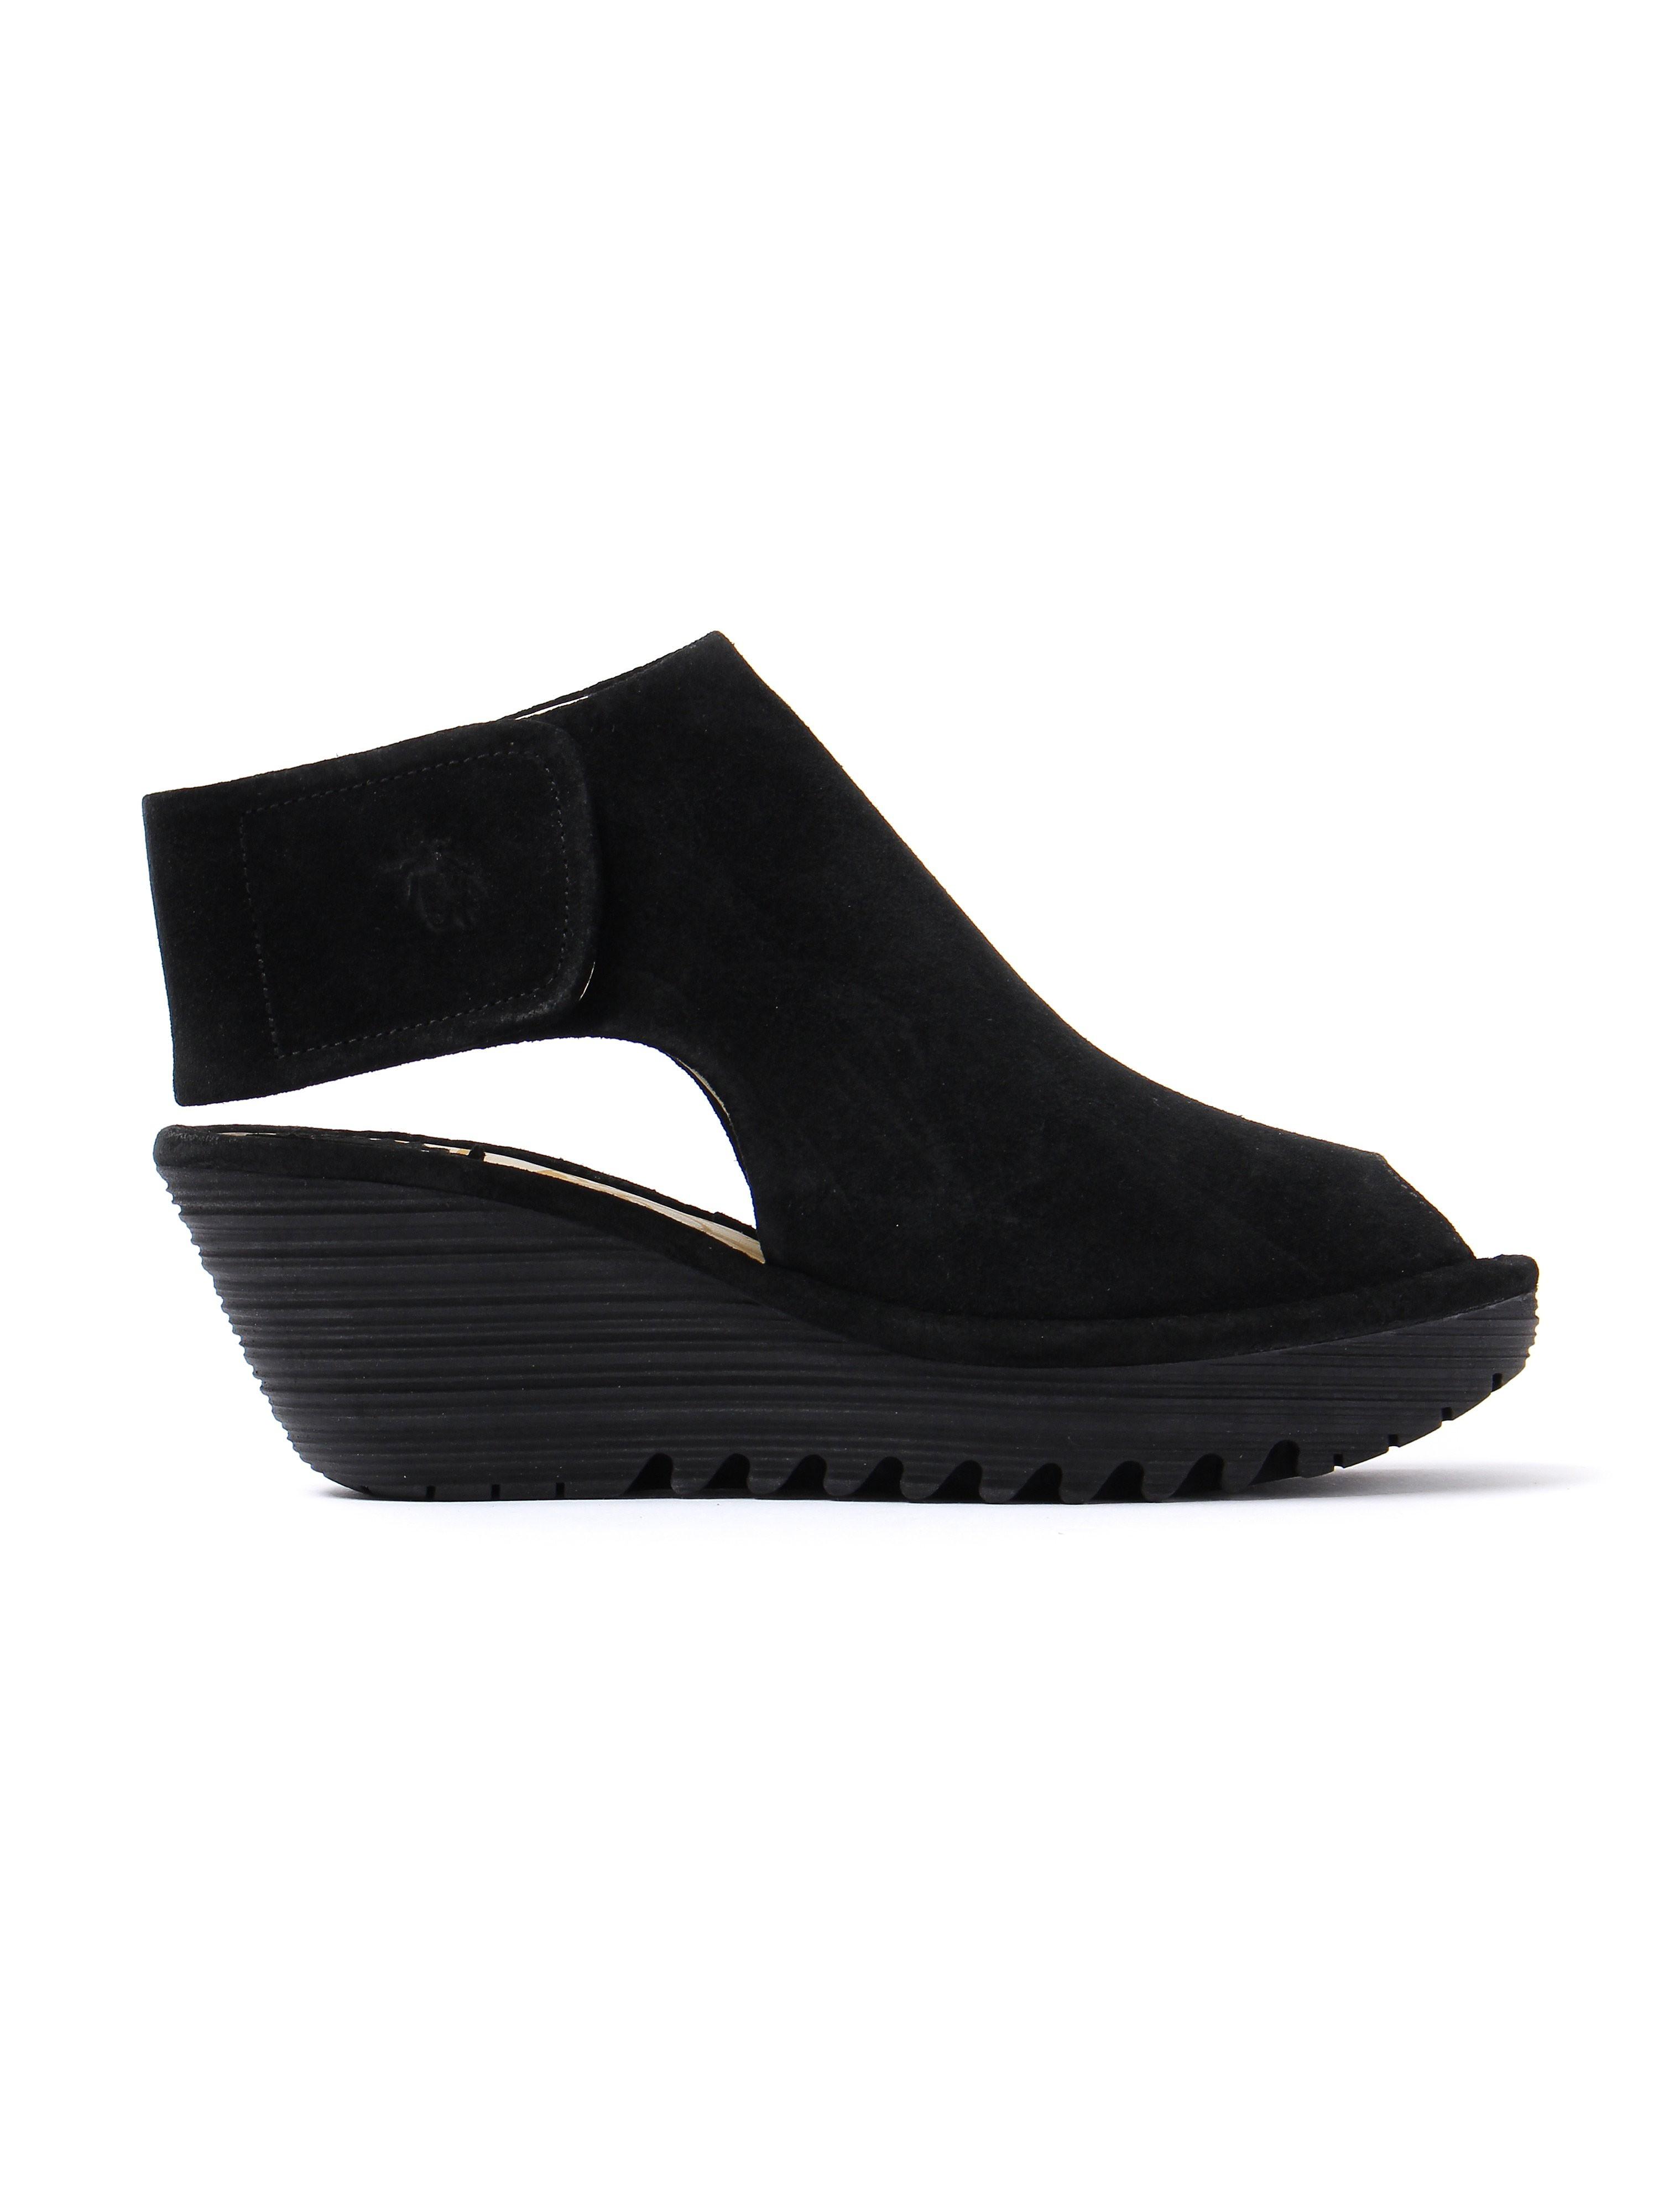 Fly London Women's Yone Suede Wedge Heel Shoes - Black